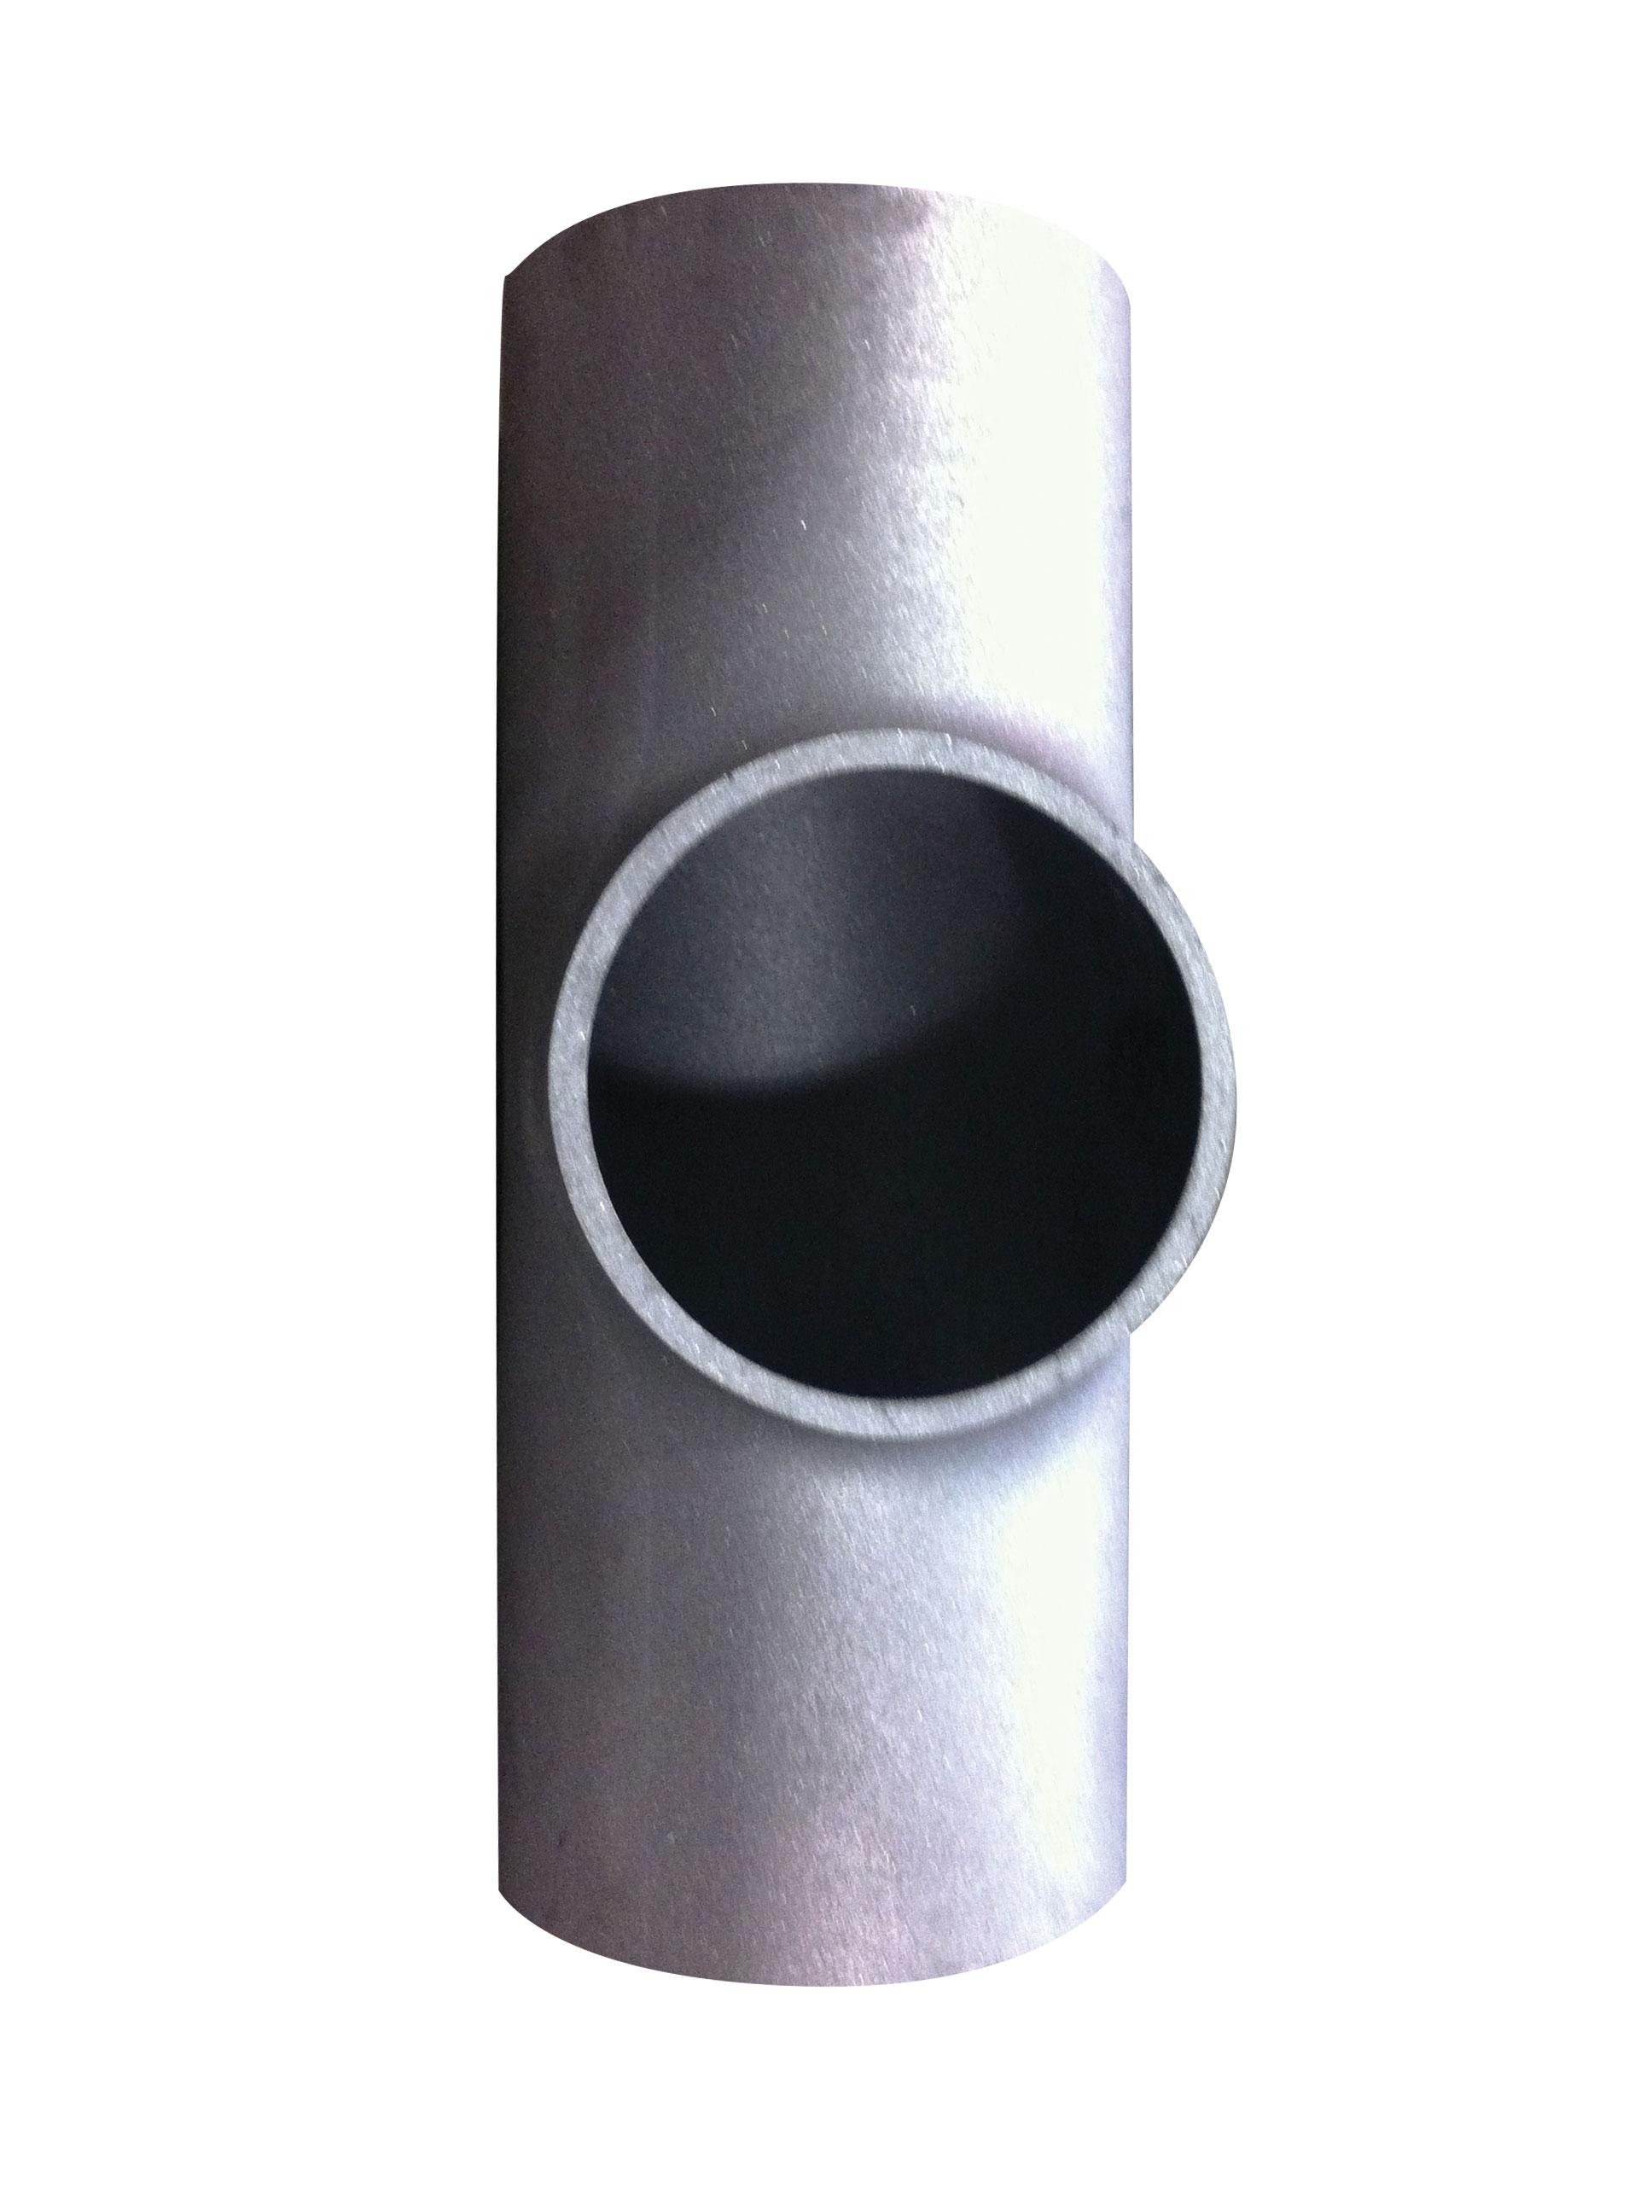 Extruded Outlet for Magnetic Level Gauge